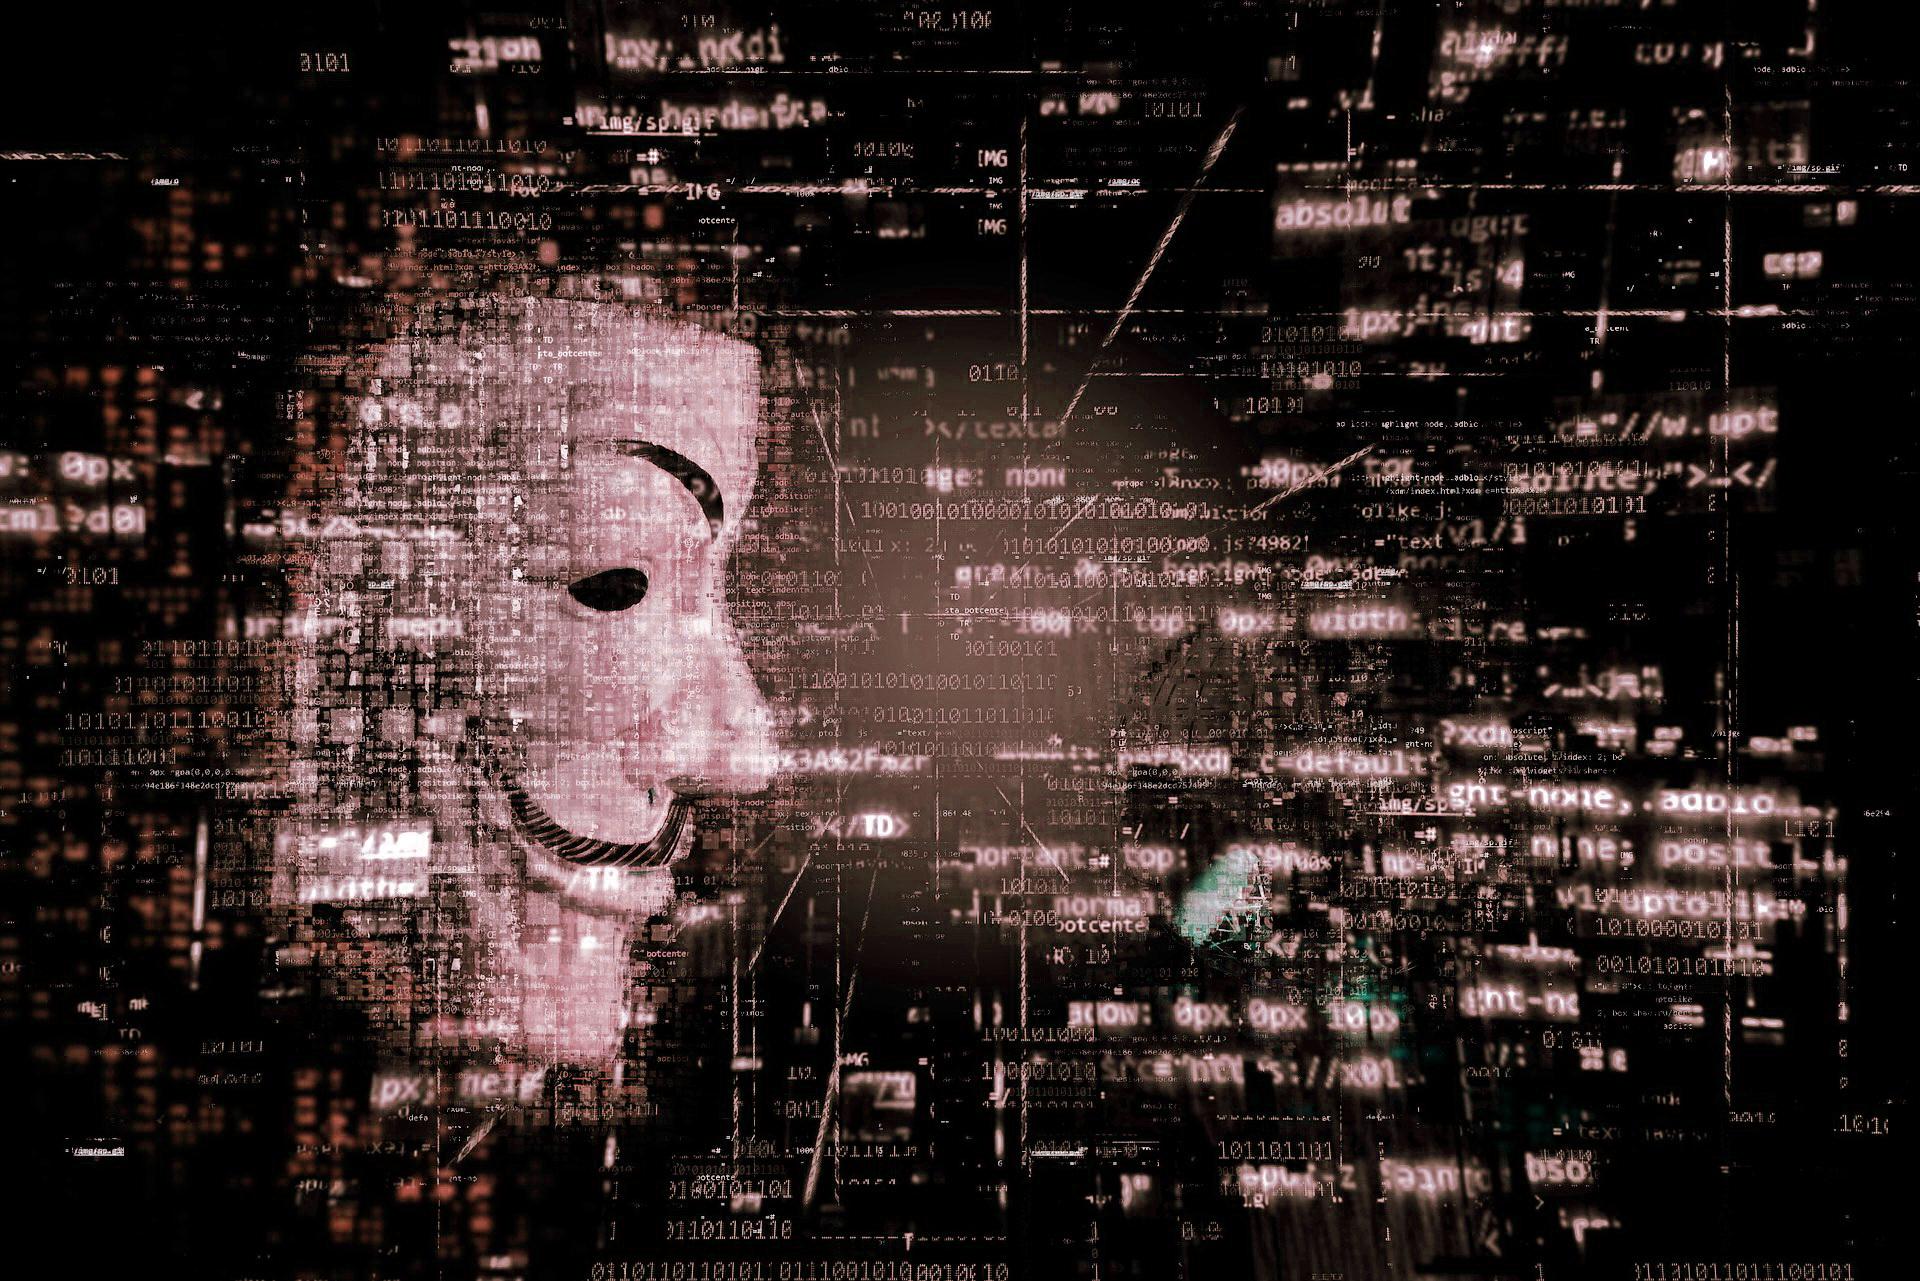 Malware for the Evilnum hack group